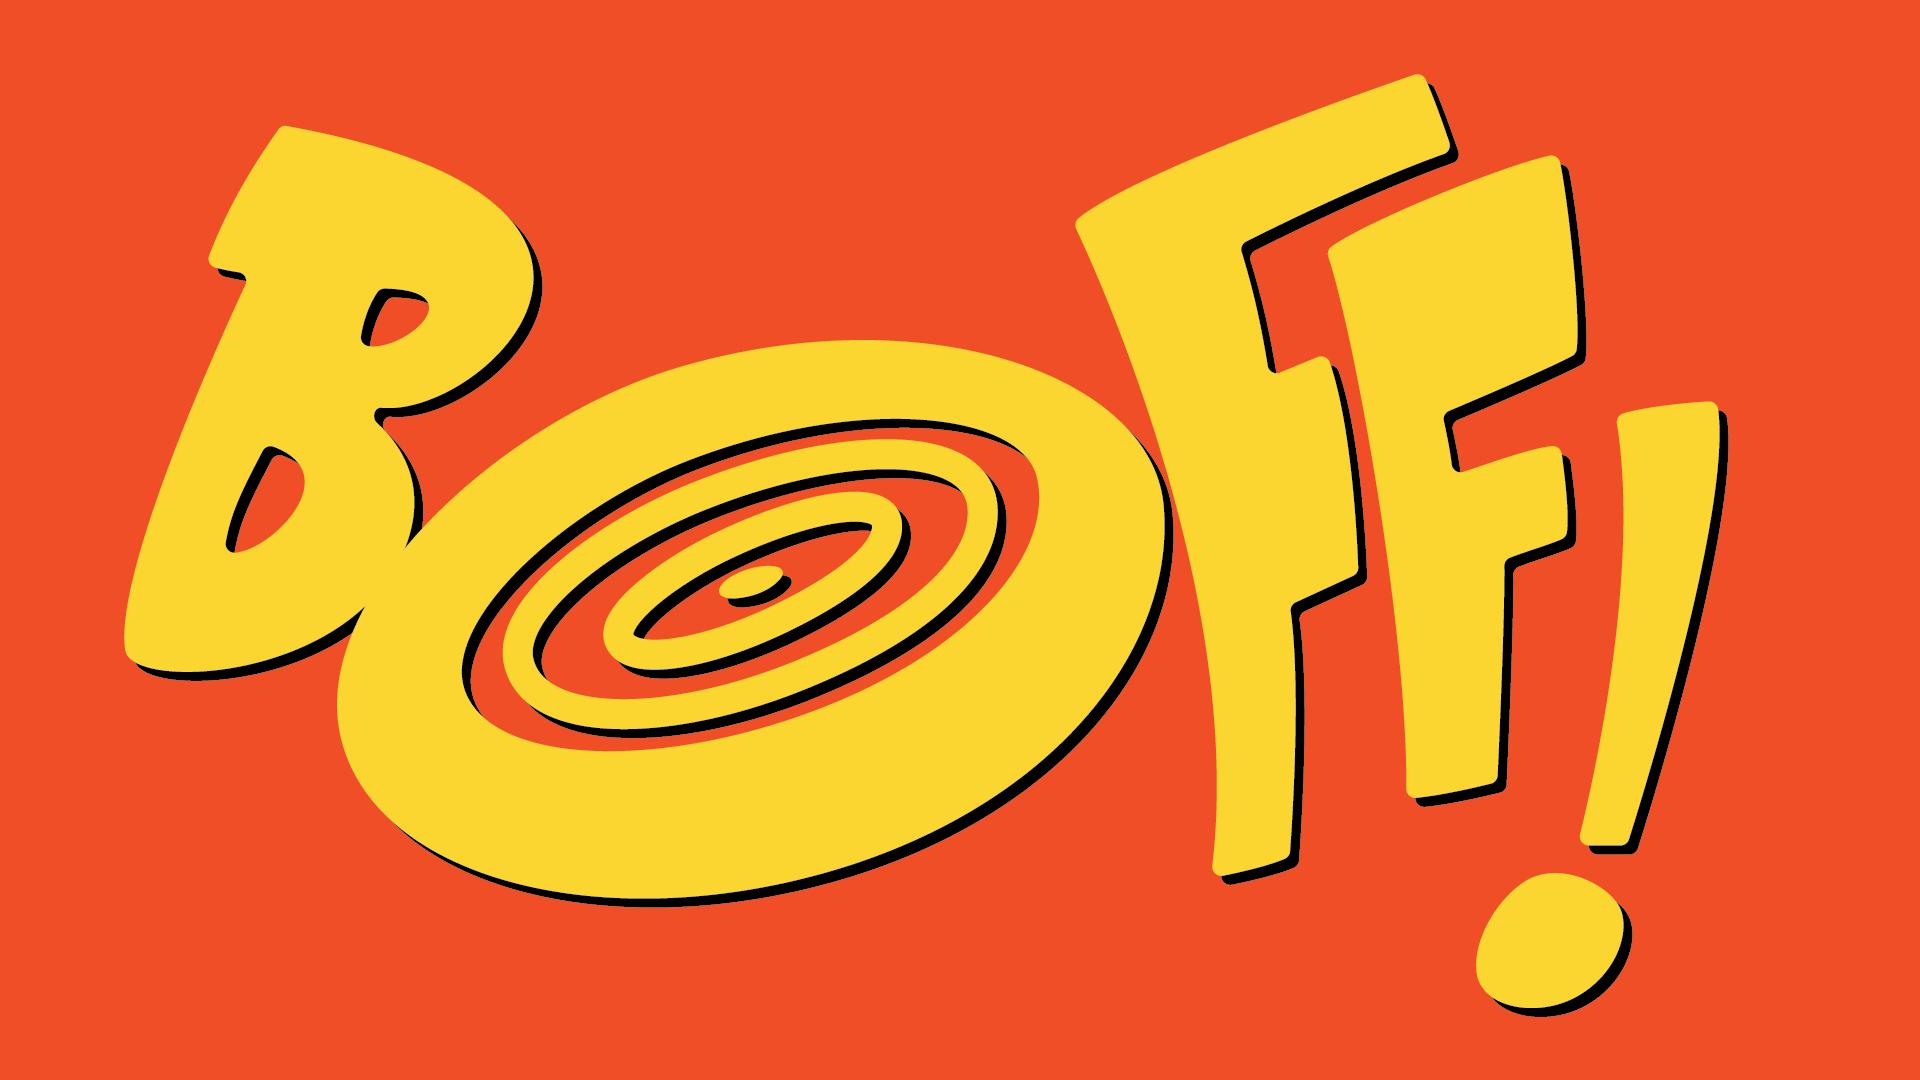 Boff.png